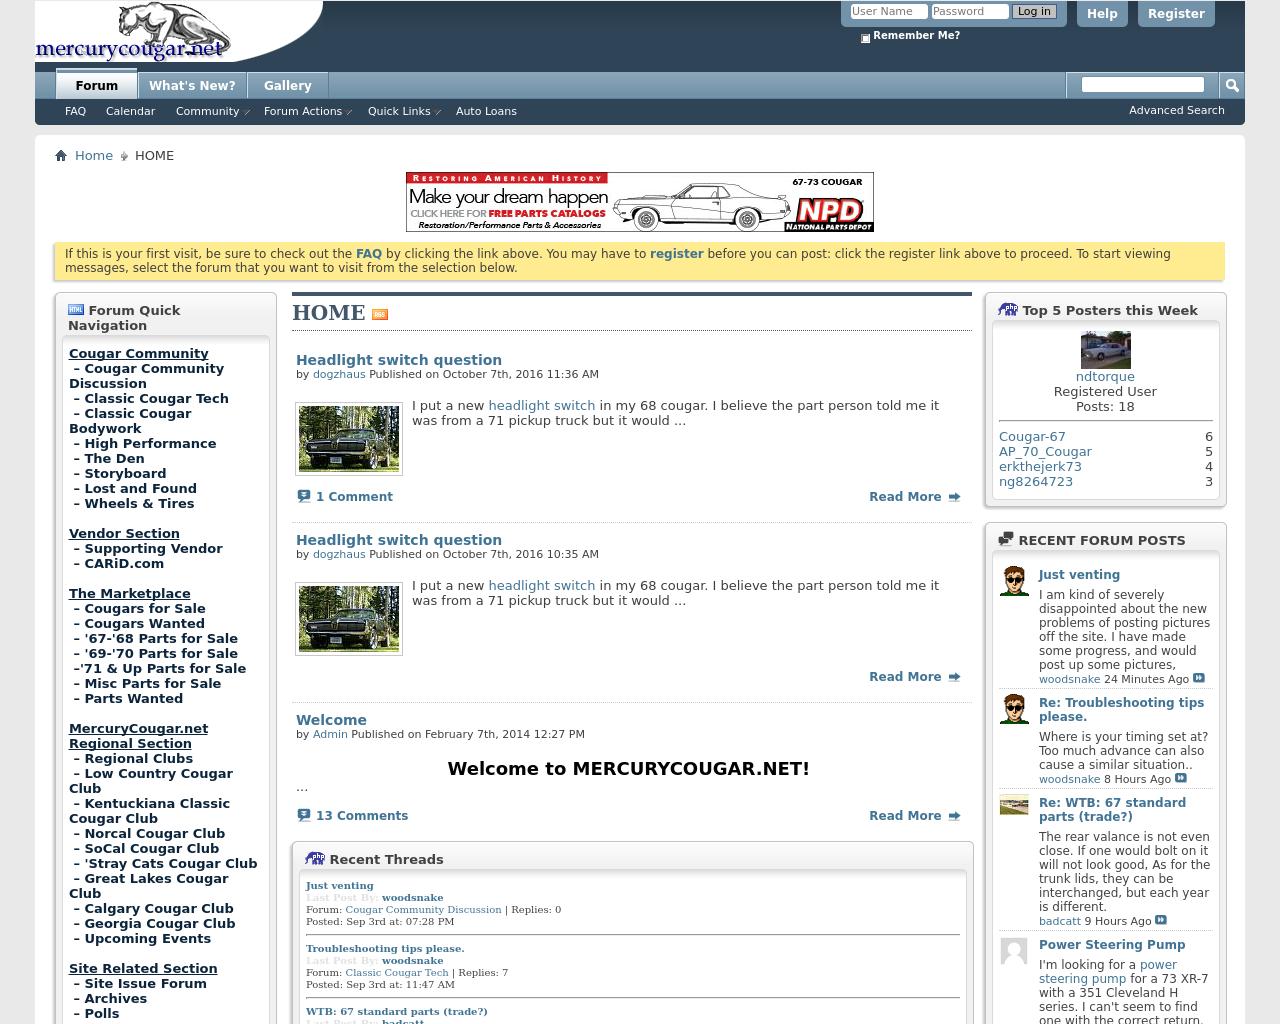 MERCURYCOUGAR.NET-Advertising-Reviews-Pricing